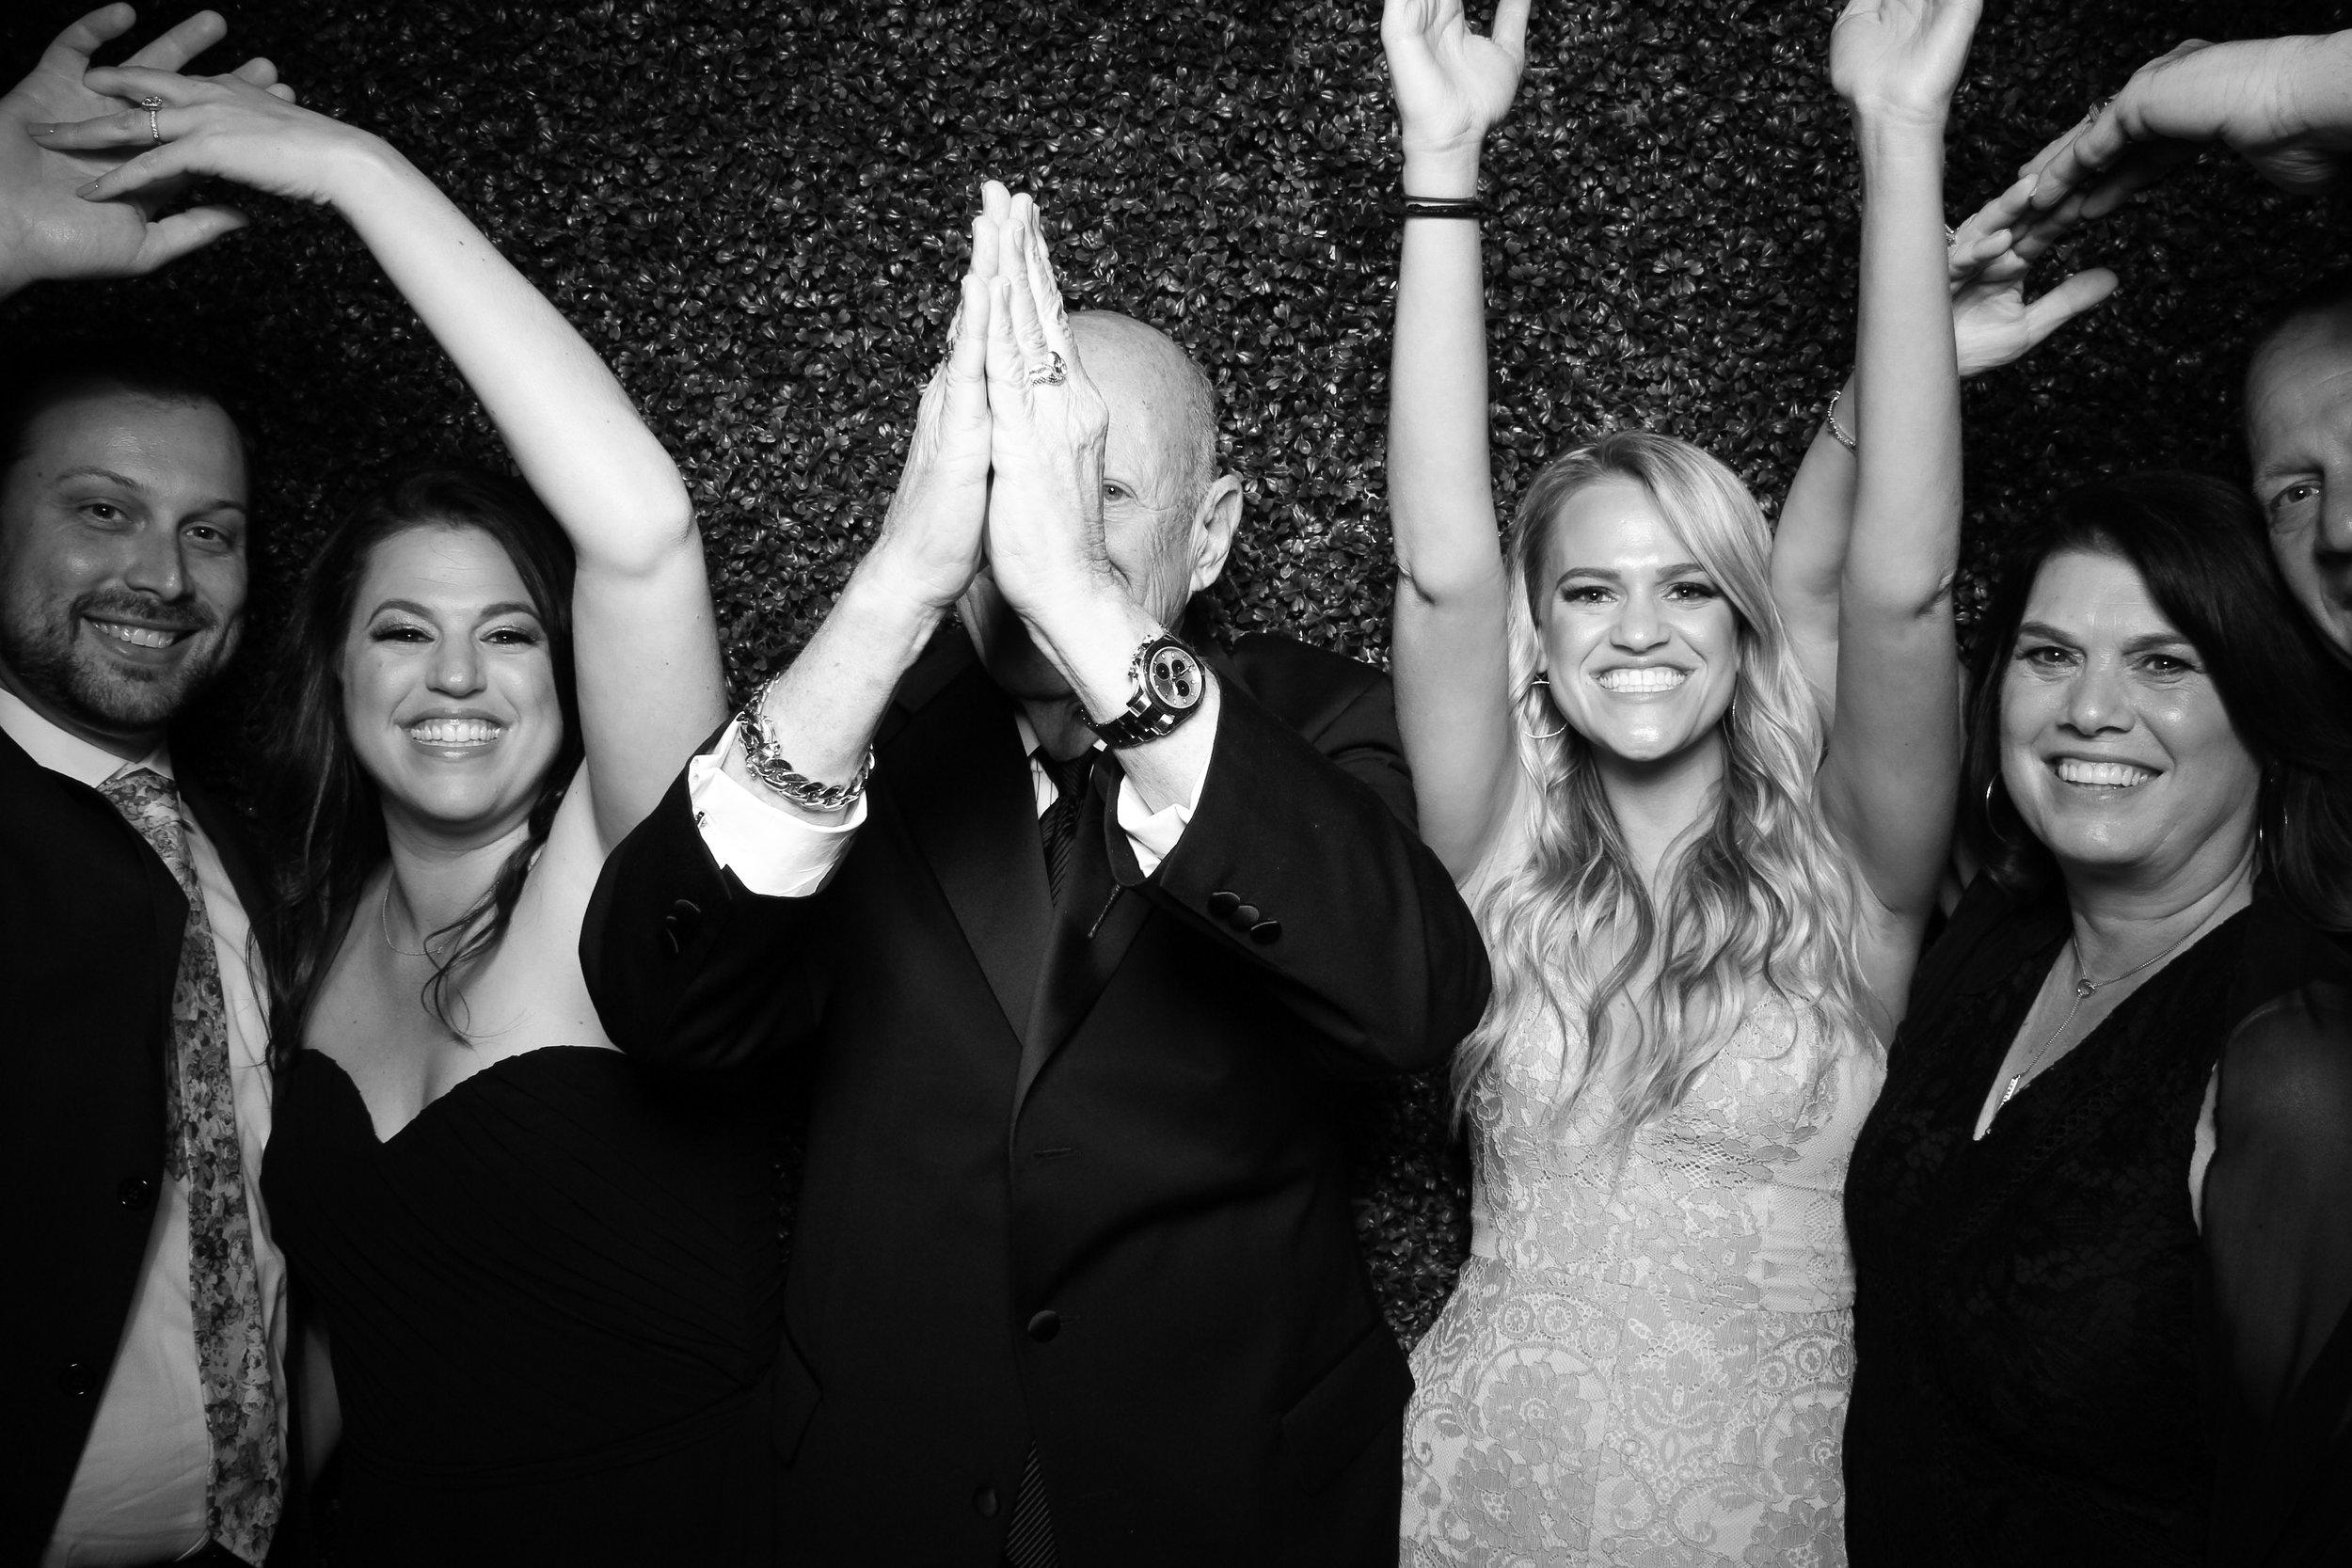 Ivy_Room_Chicago_Wedding_Reception_Photo_Booth_Rental__10.jpg